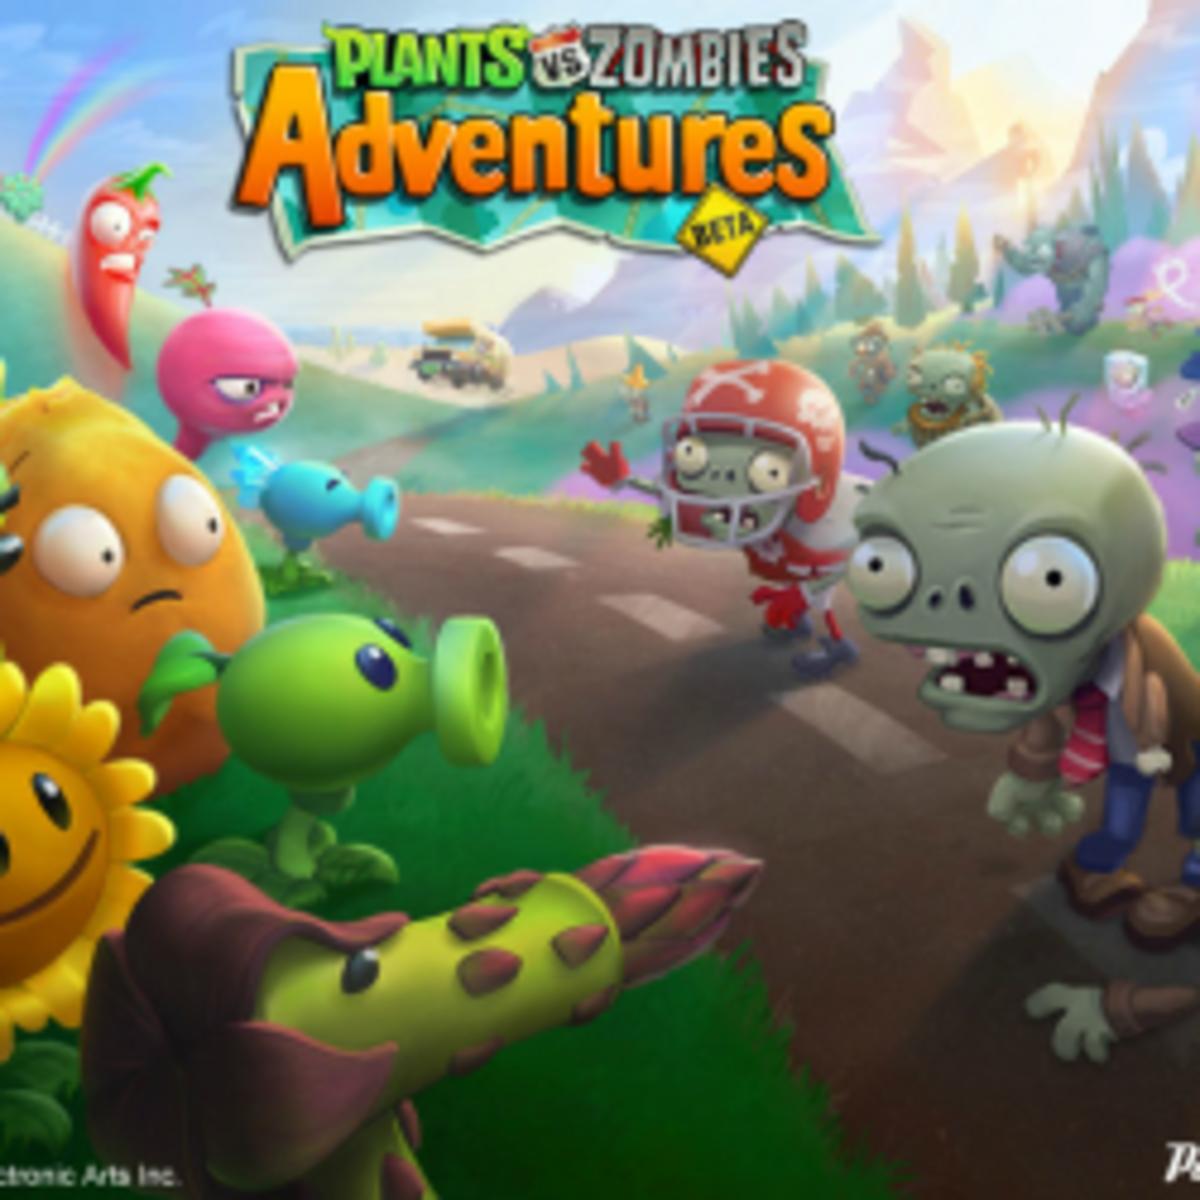 plants-vs-zombies-adventures-brainball-offense